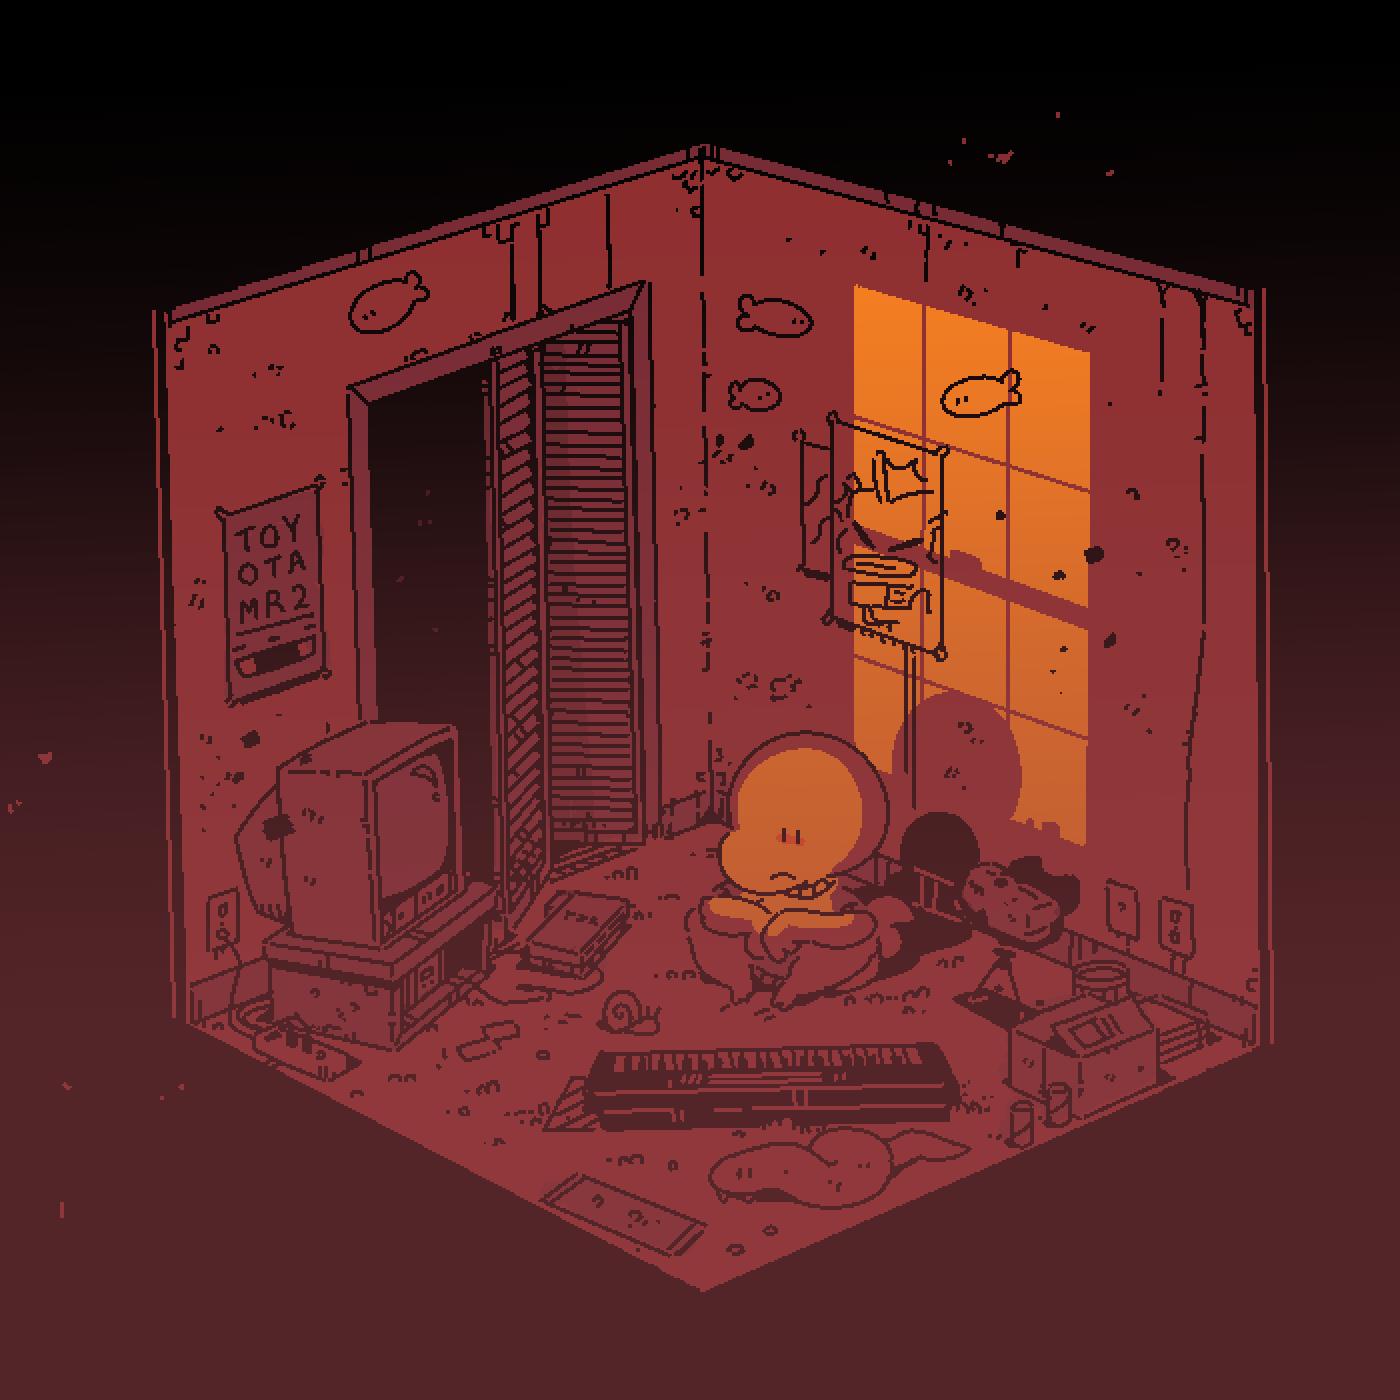 gordon bedroom